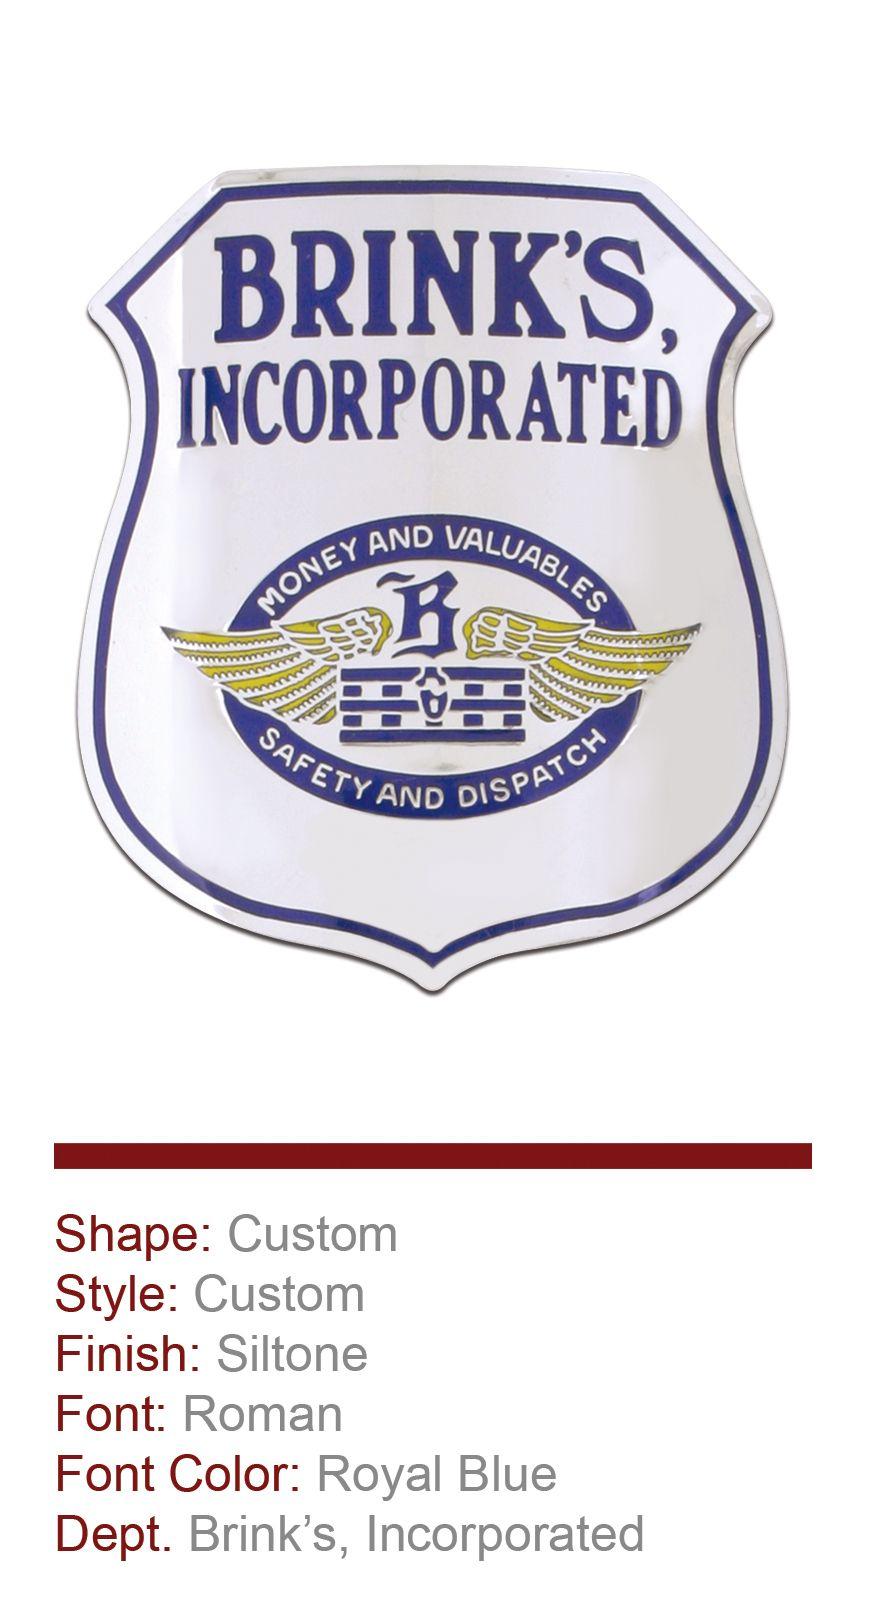 Brinks Incorporated